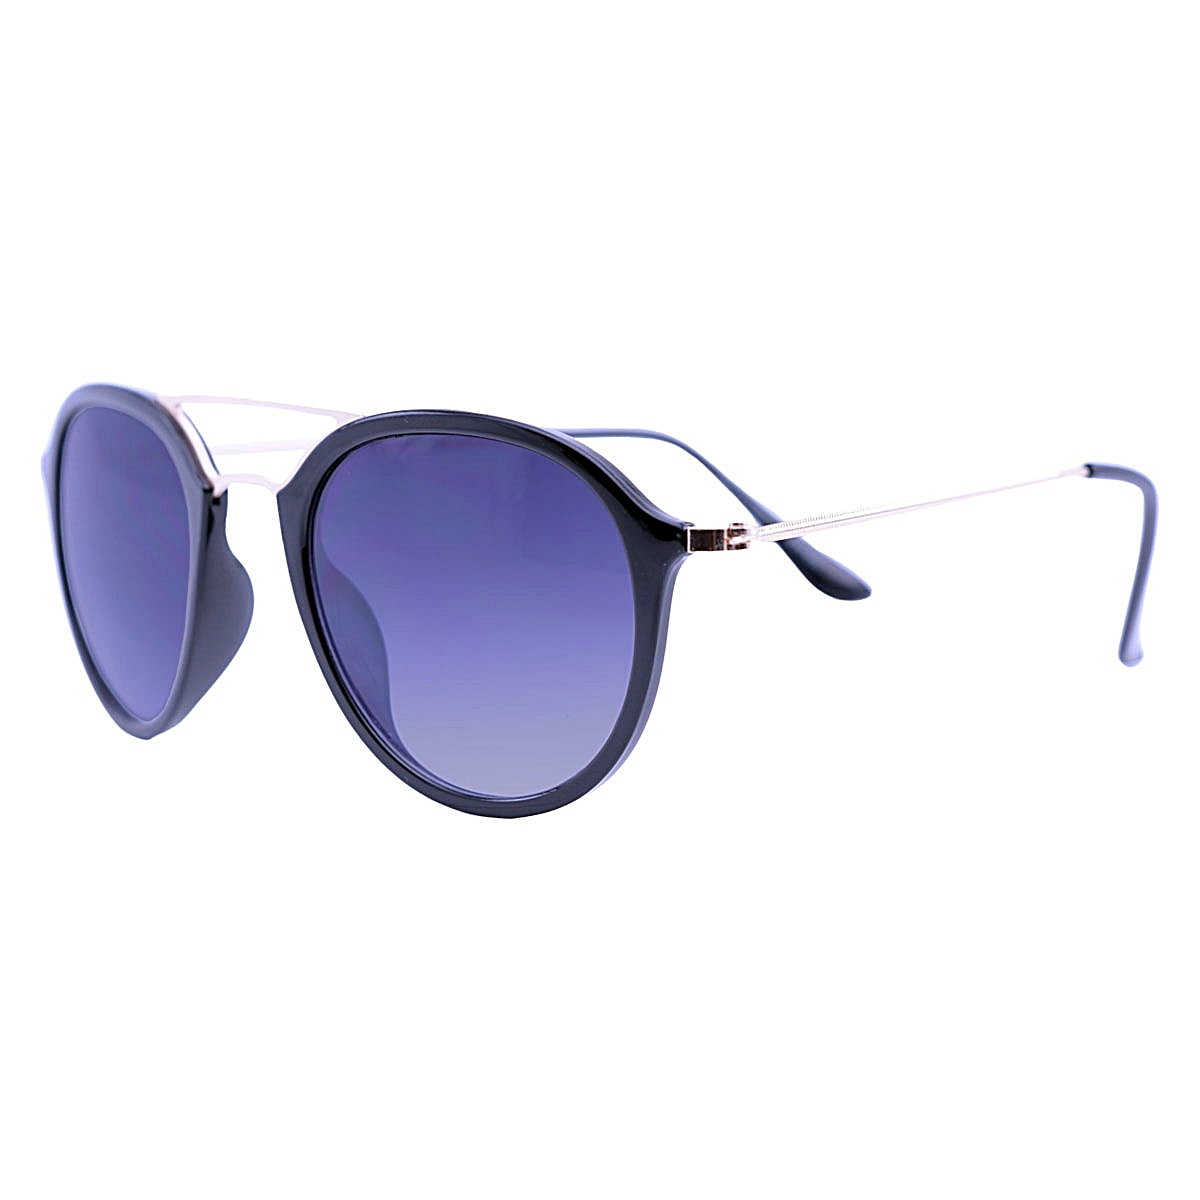 Óculos De Sol Mackage Unisex Acetato Aviator